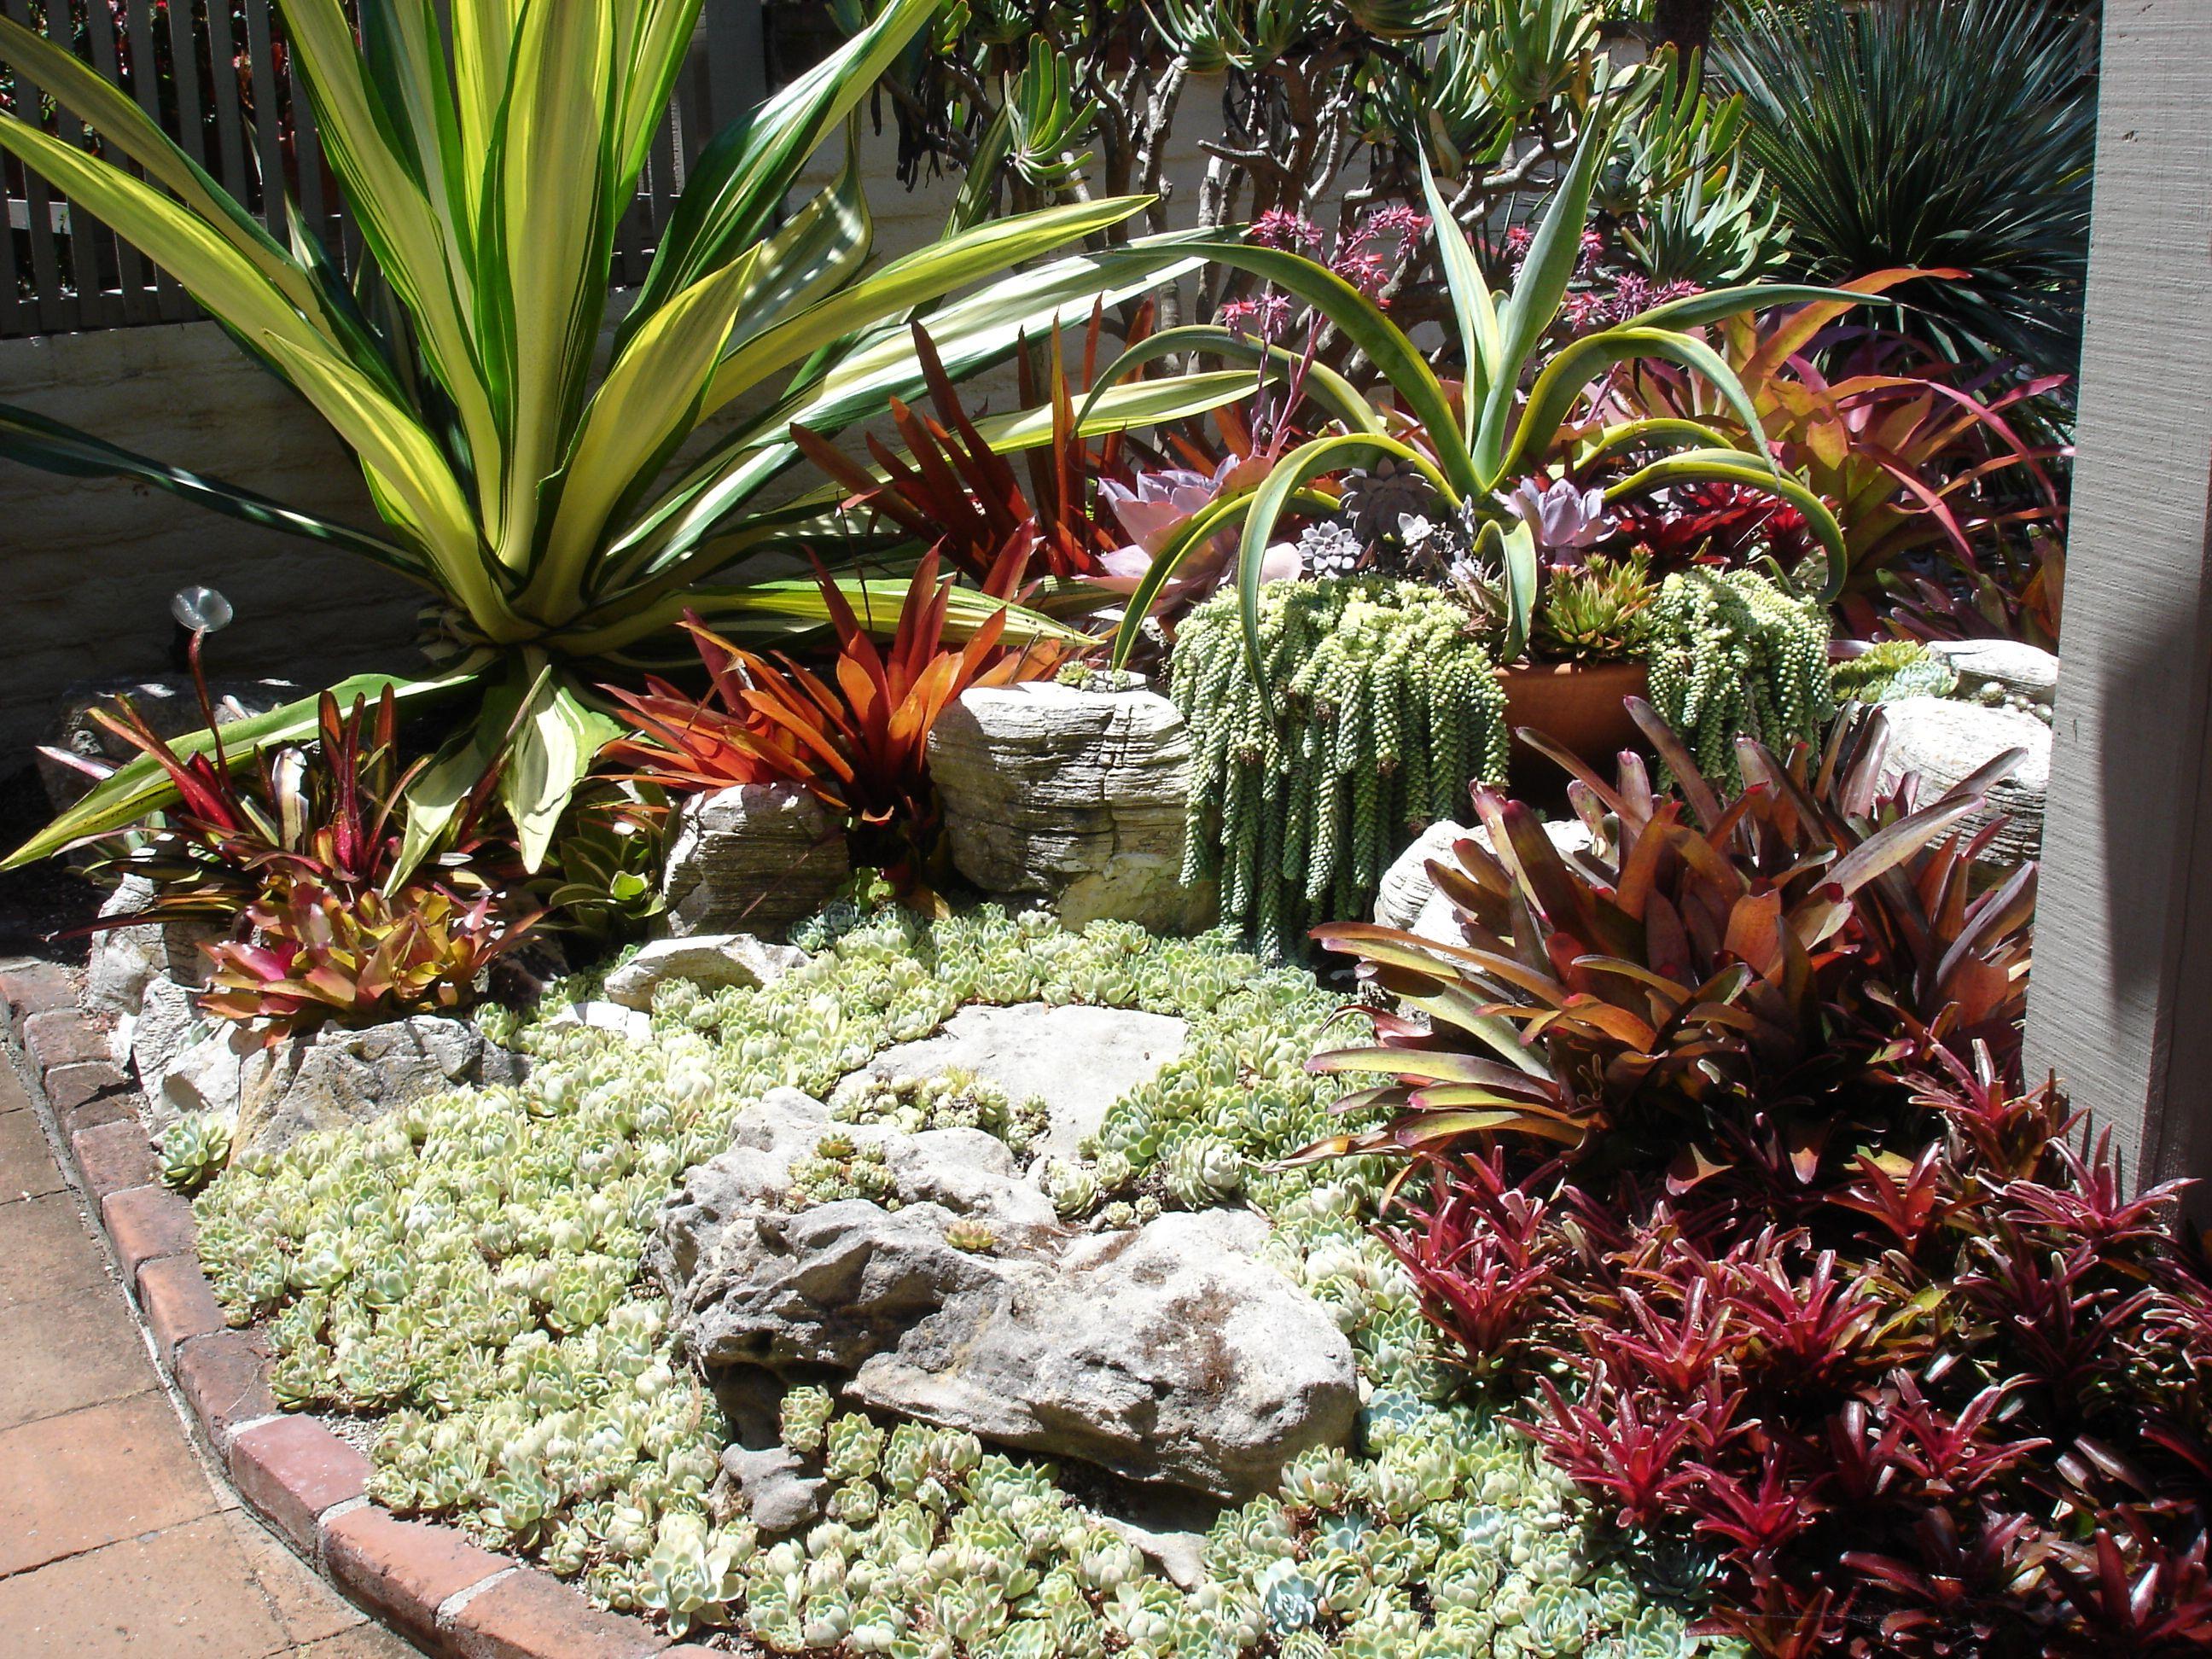 Cactus U0026 Succulent Garden Design At Sherman Gardens, Corona Del Mar, CA